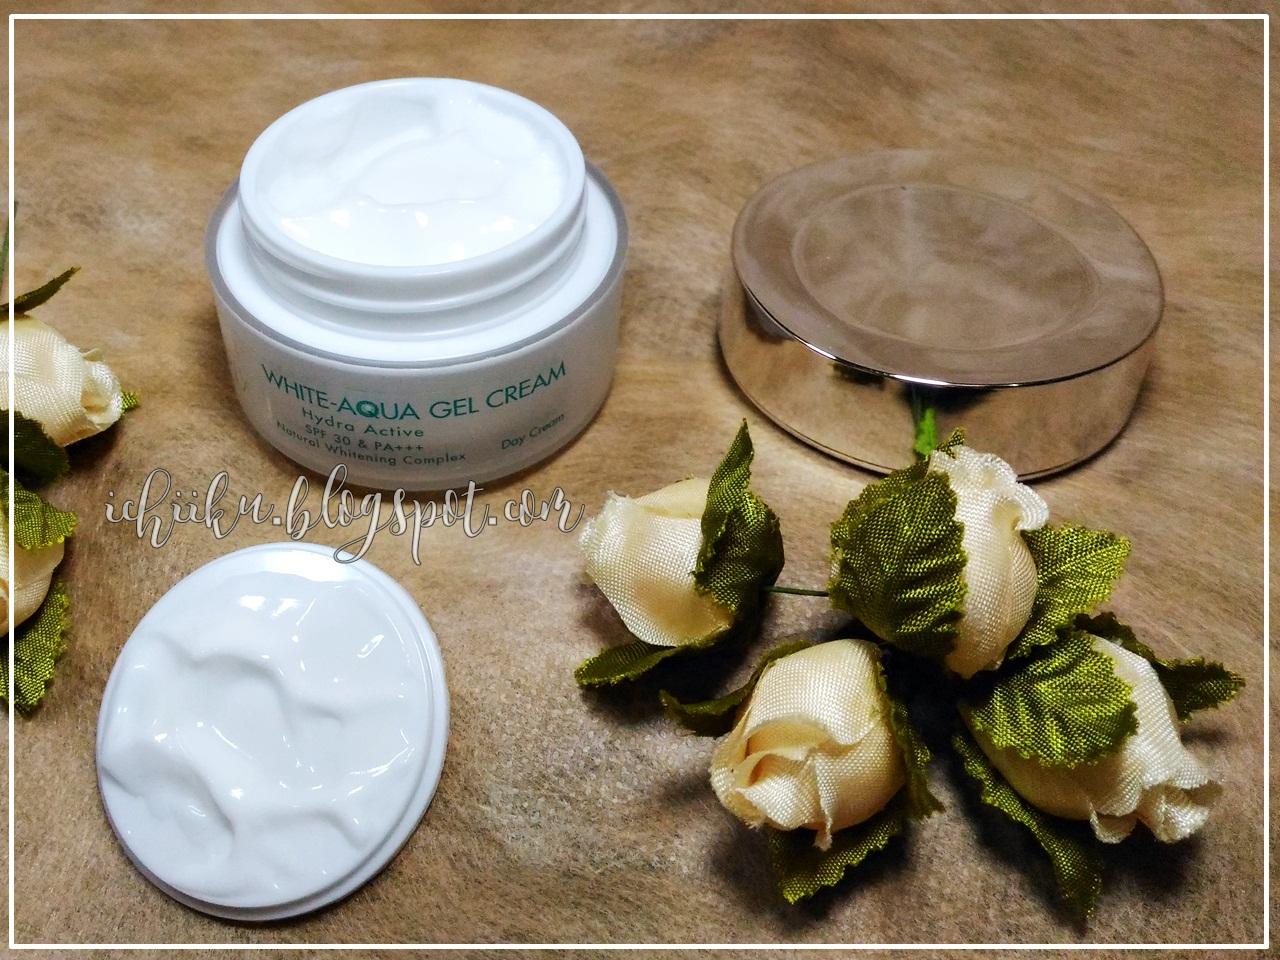 Review Pixy White Aqua Gel Cream